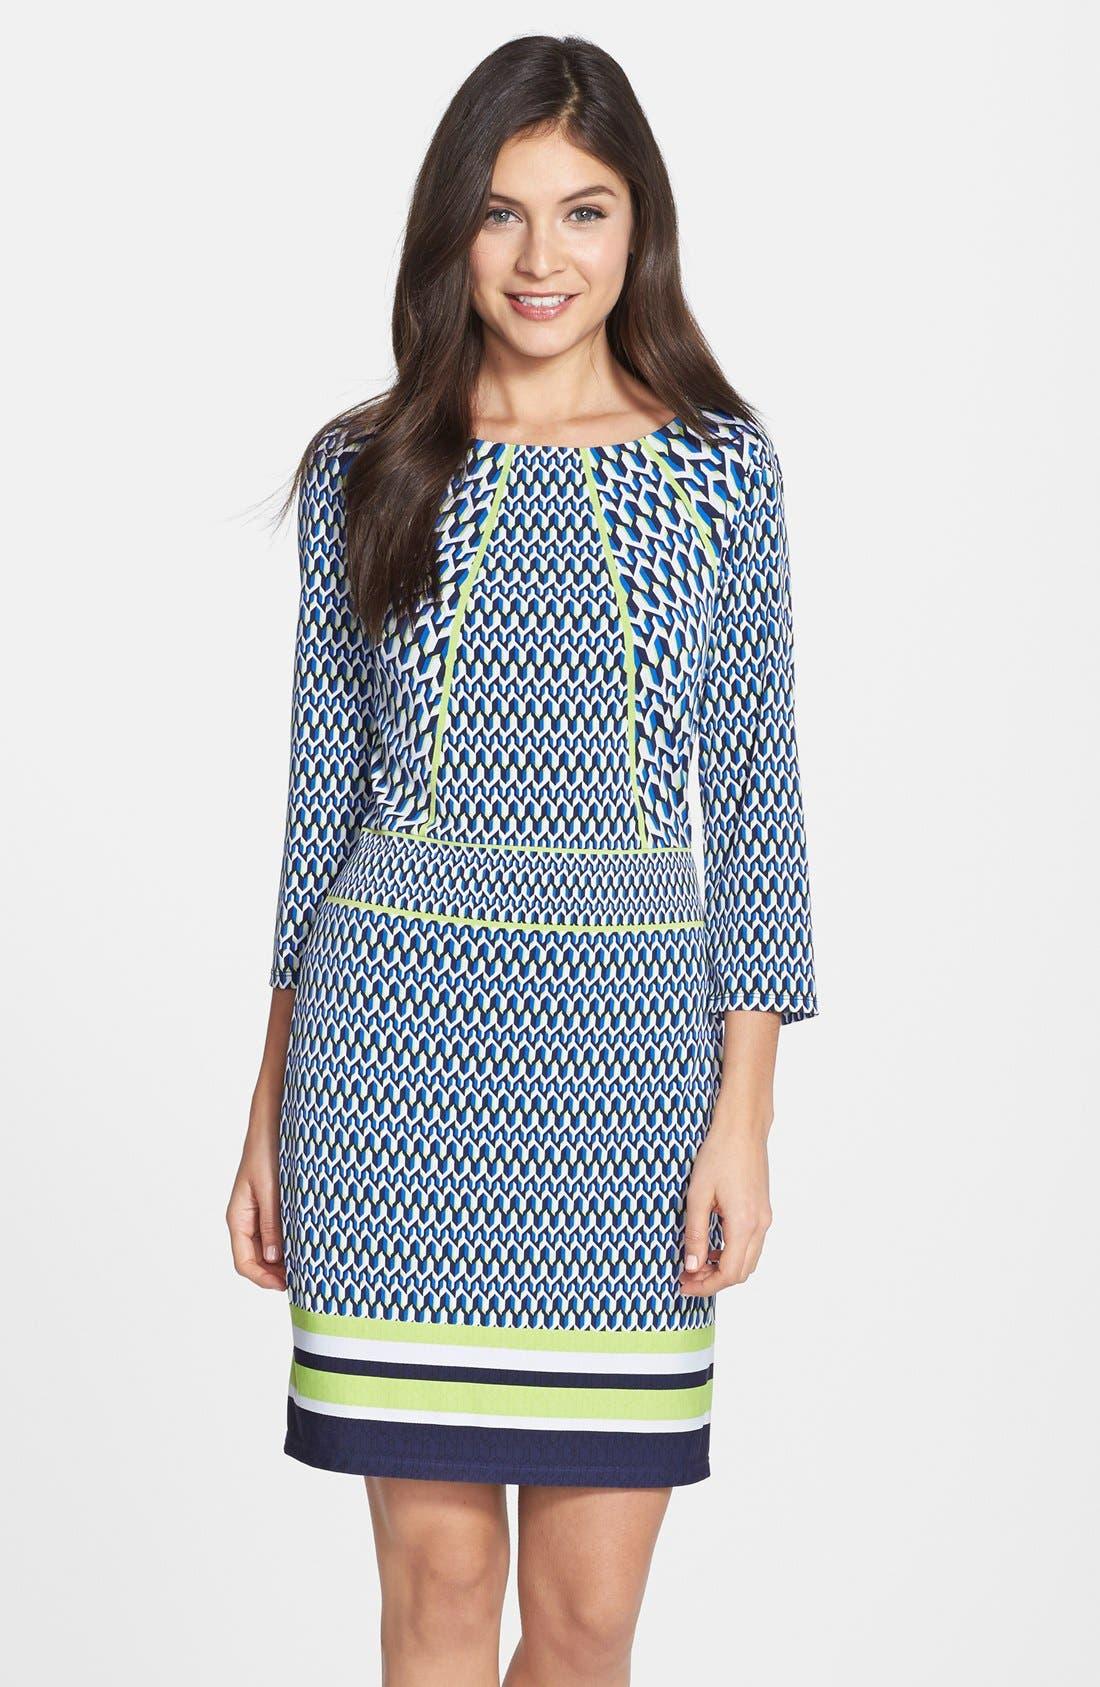 Main Image - Laundry by Shelli Segal Print Jersey Sheath Dress (Regular & Petite)